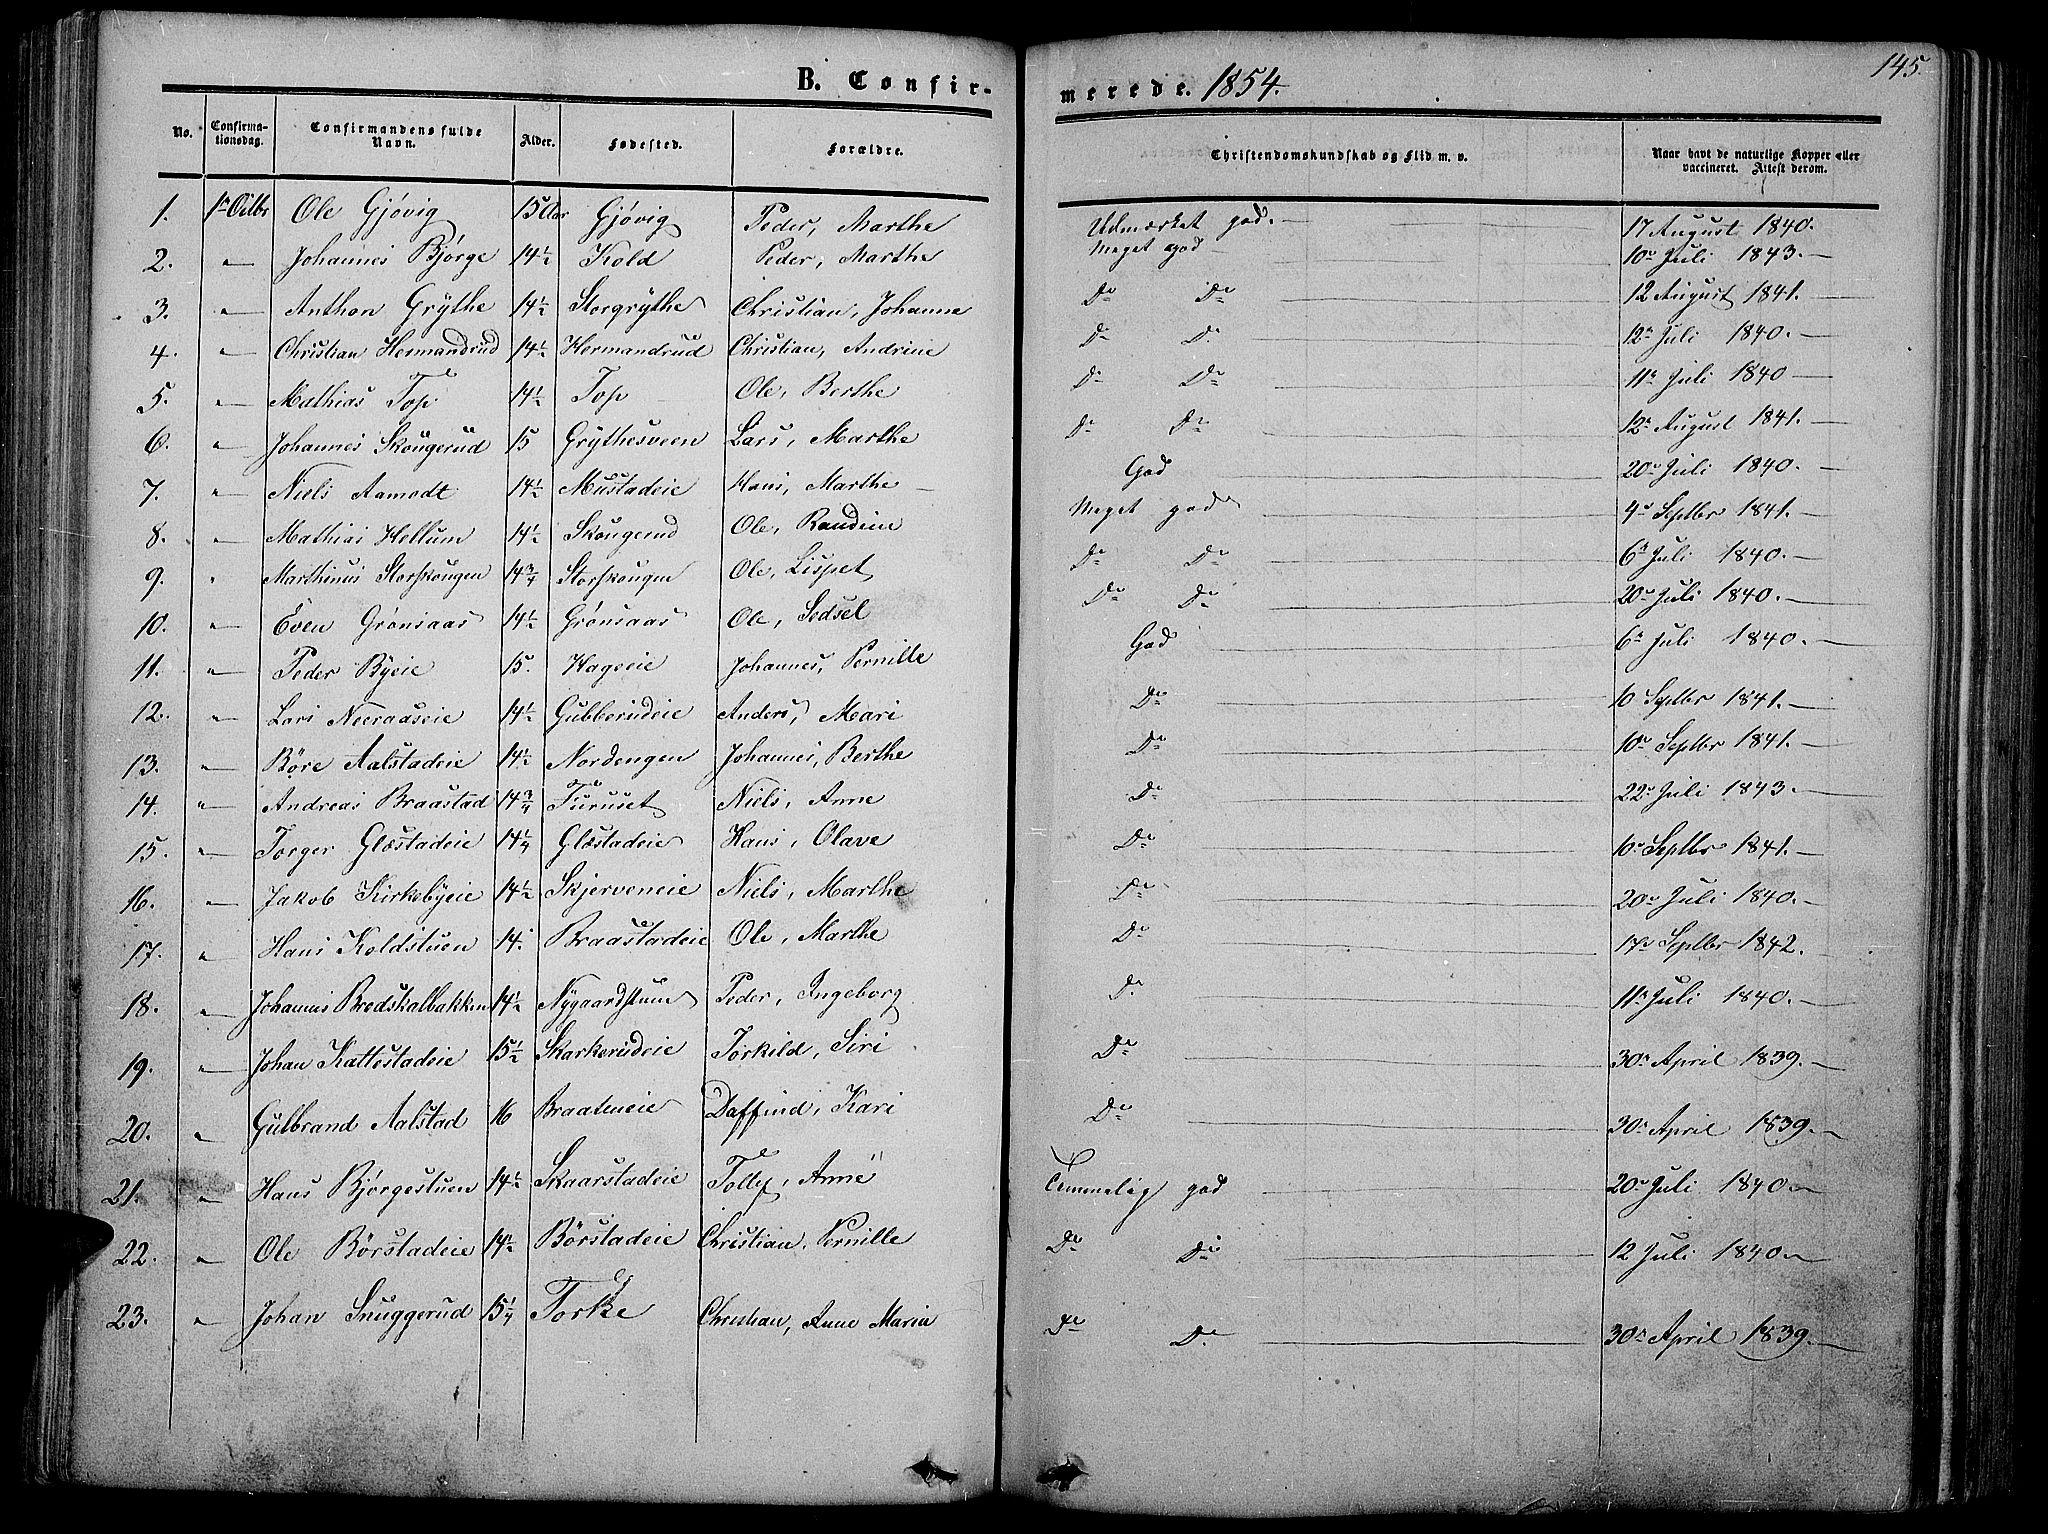 SAH, Vardal prestekontor, H/Ha/Hab/L0005: Klokkerbok nr. 5, 1854-1868, s. 145